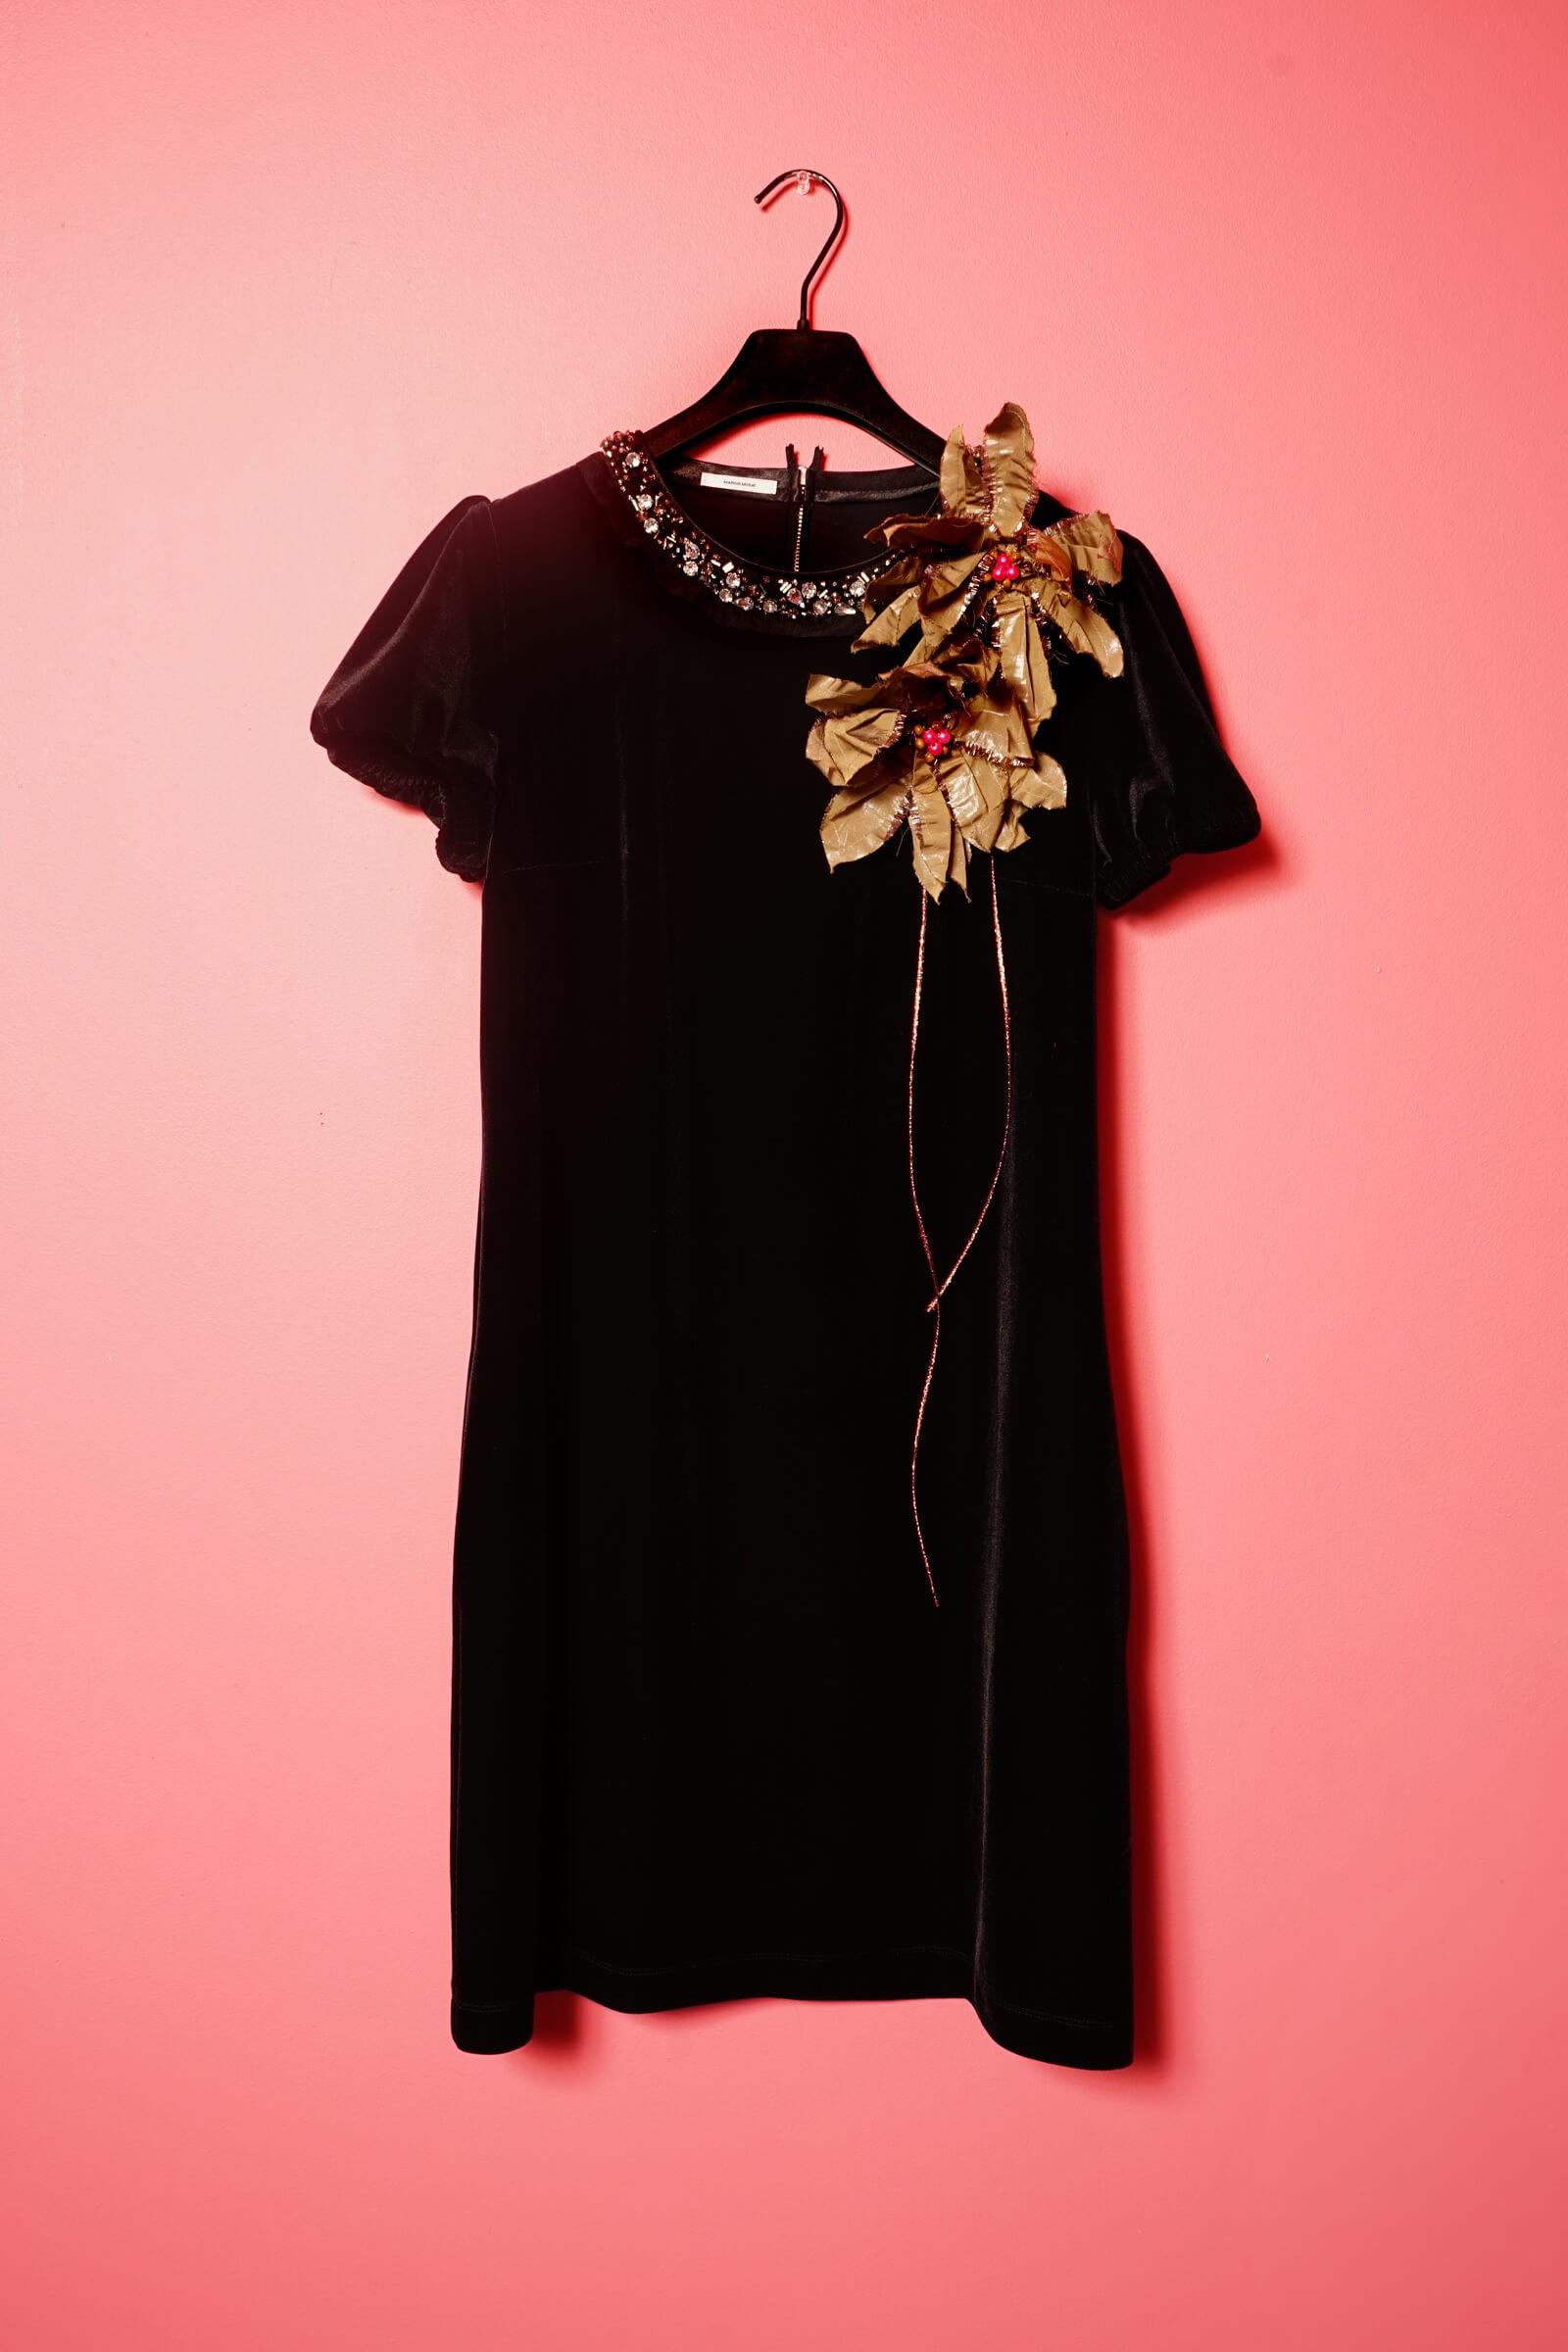 Rochie neagra din catifea si aplicatii pietre